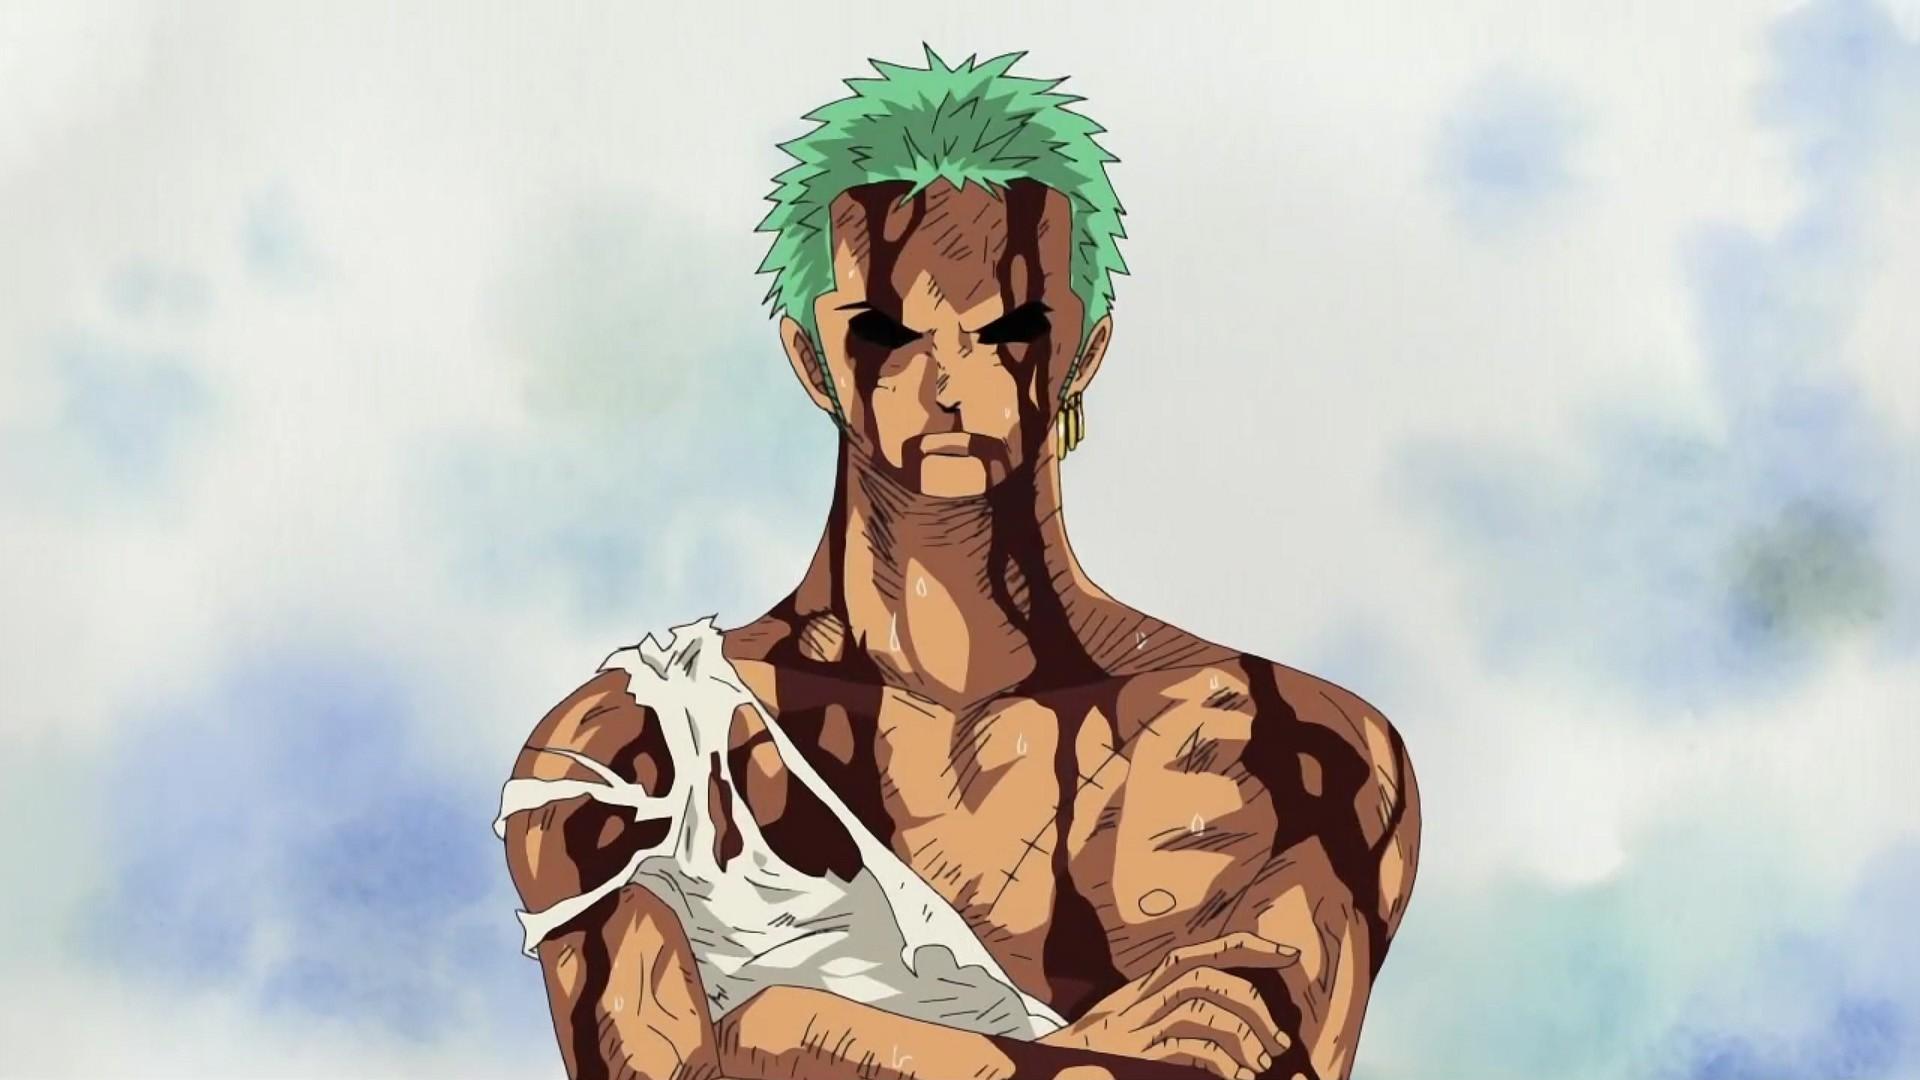 Illustration Anime One Piece Roronoa Zoro Screenshot 1920x1080 Px